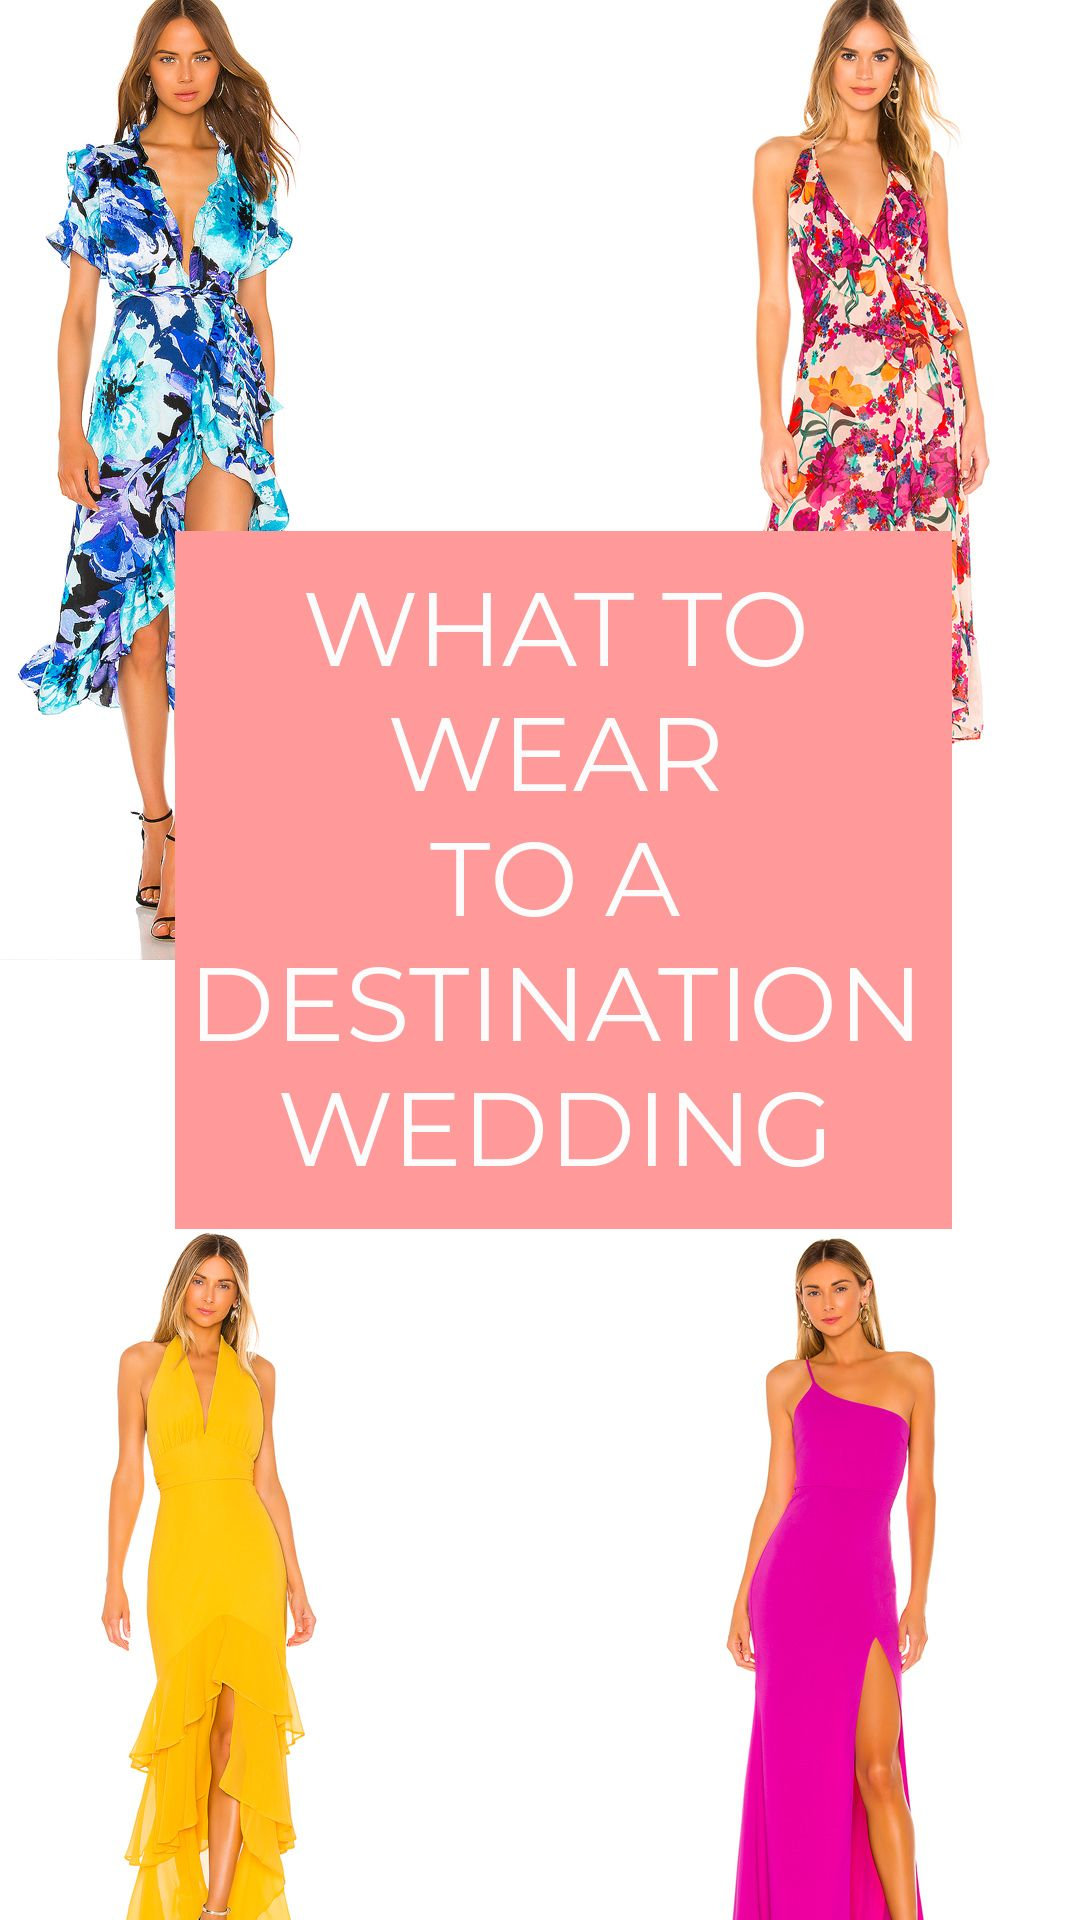 What To Wear To A Destination Wedding Destination Wedding Outfit Destination Wedding Guest Dress Beach Wedding Guest Dress [ 1920 x 1080 Pixel ]